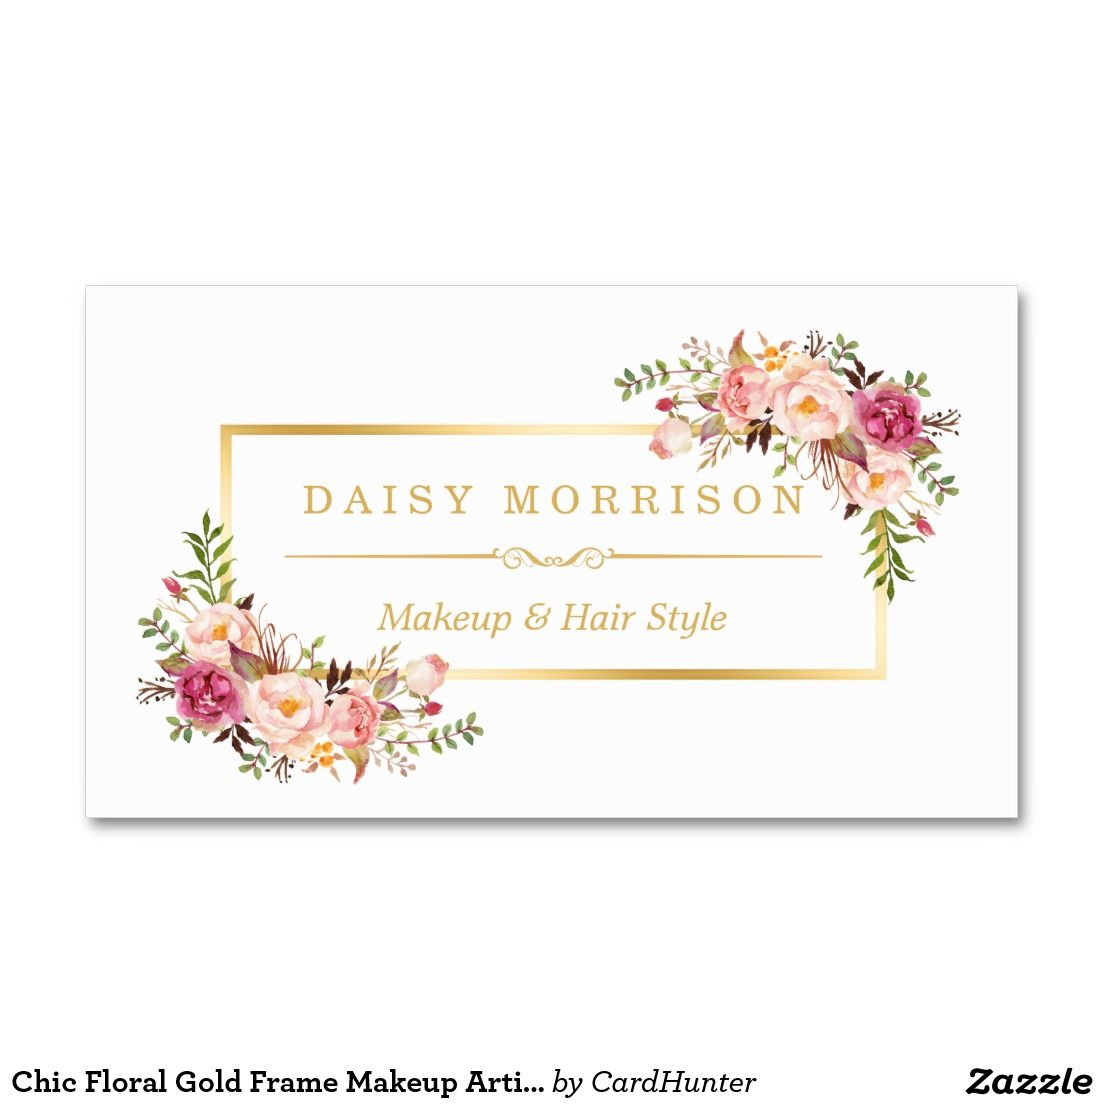 Chic Floral Gold Frame Makeup Artist Beauty Salon Business Card ...